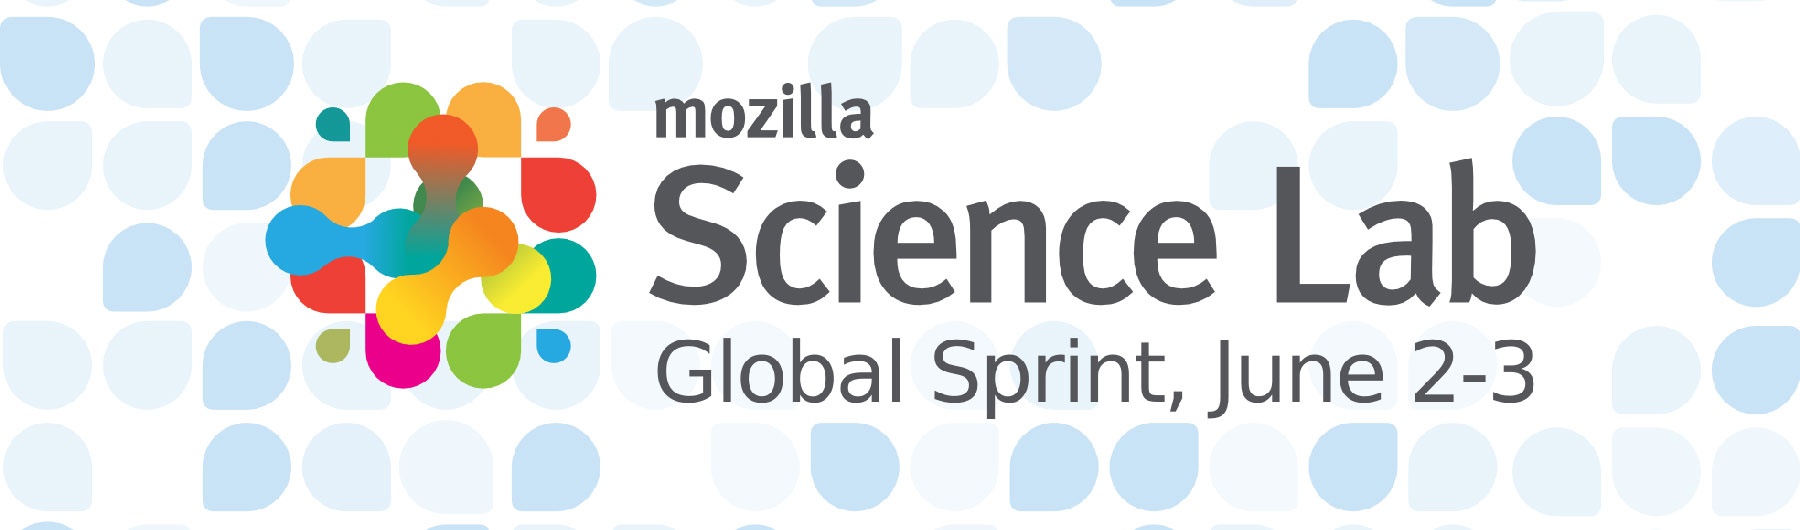 Mozilla Science Global Sprint 2016, Madrid